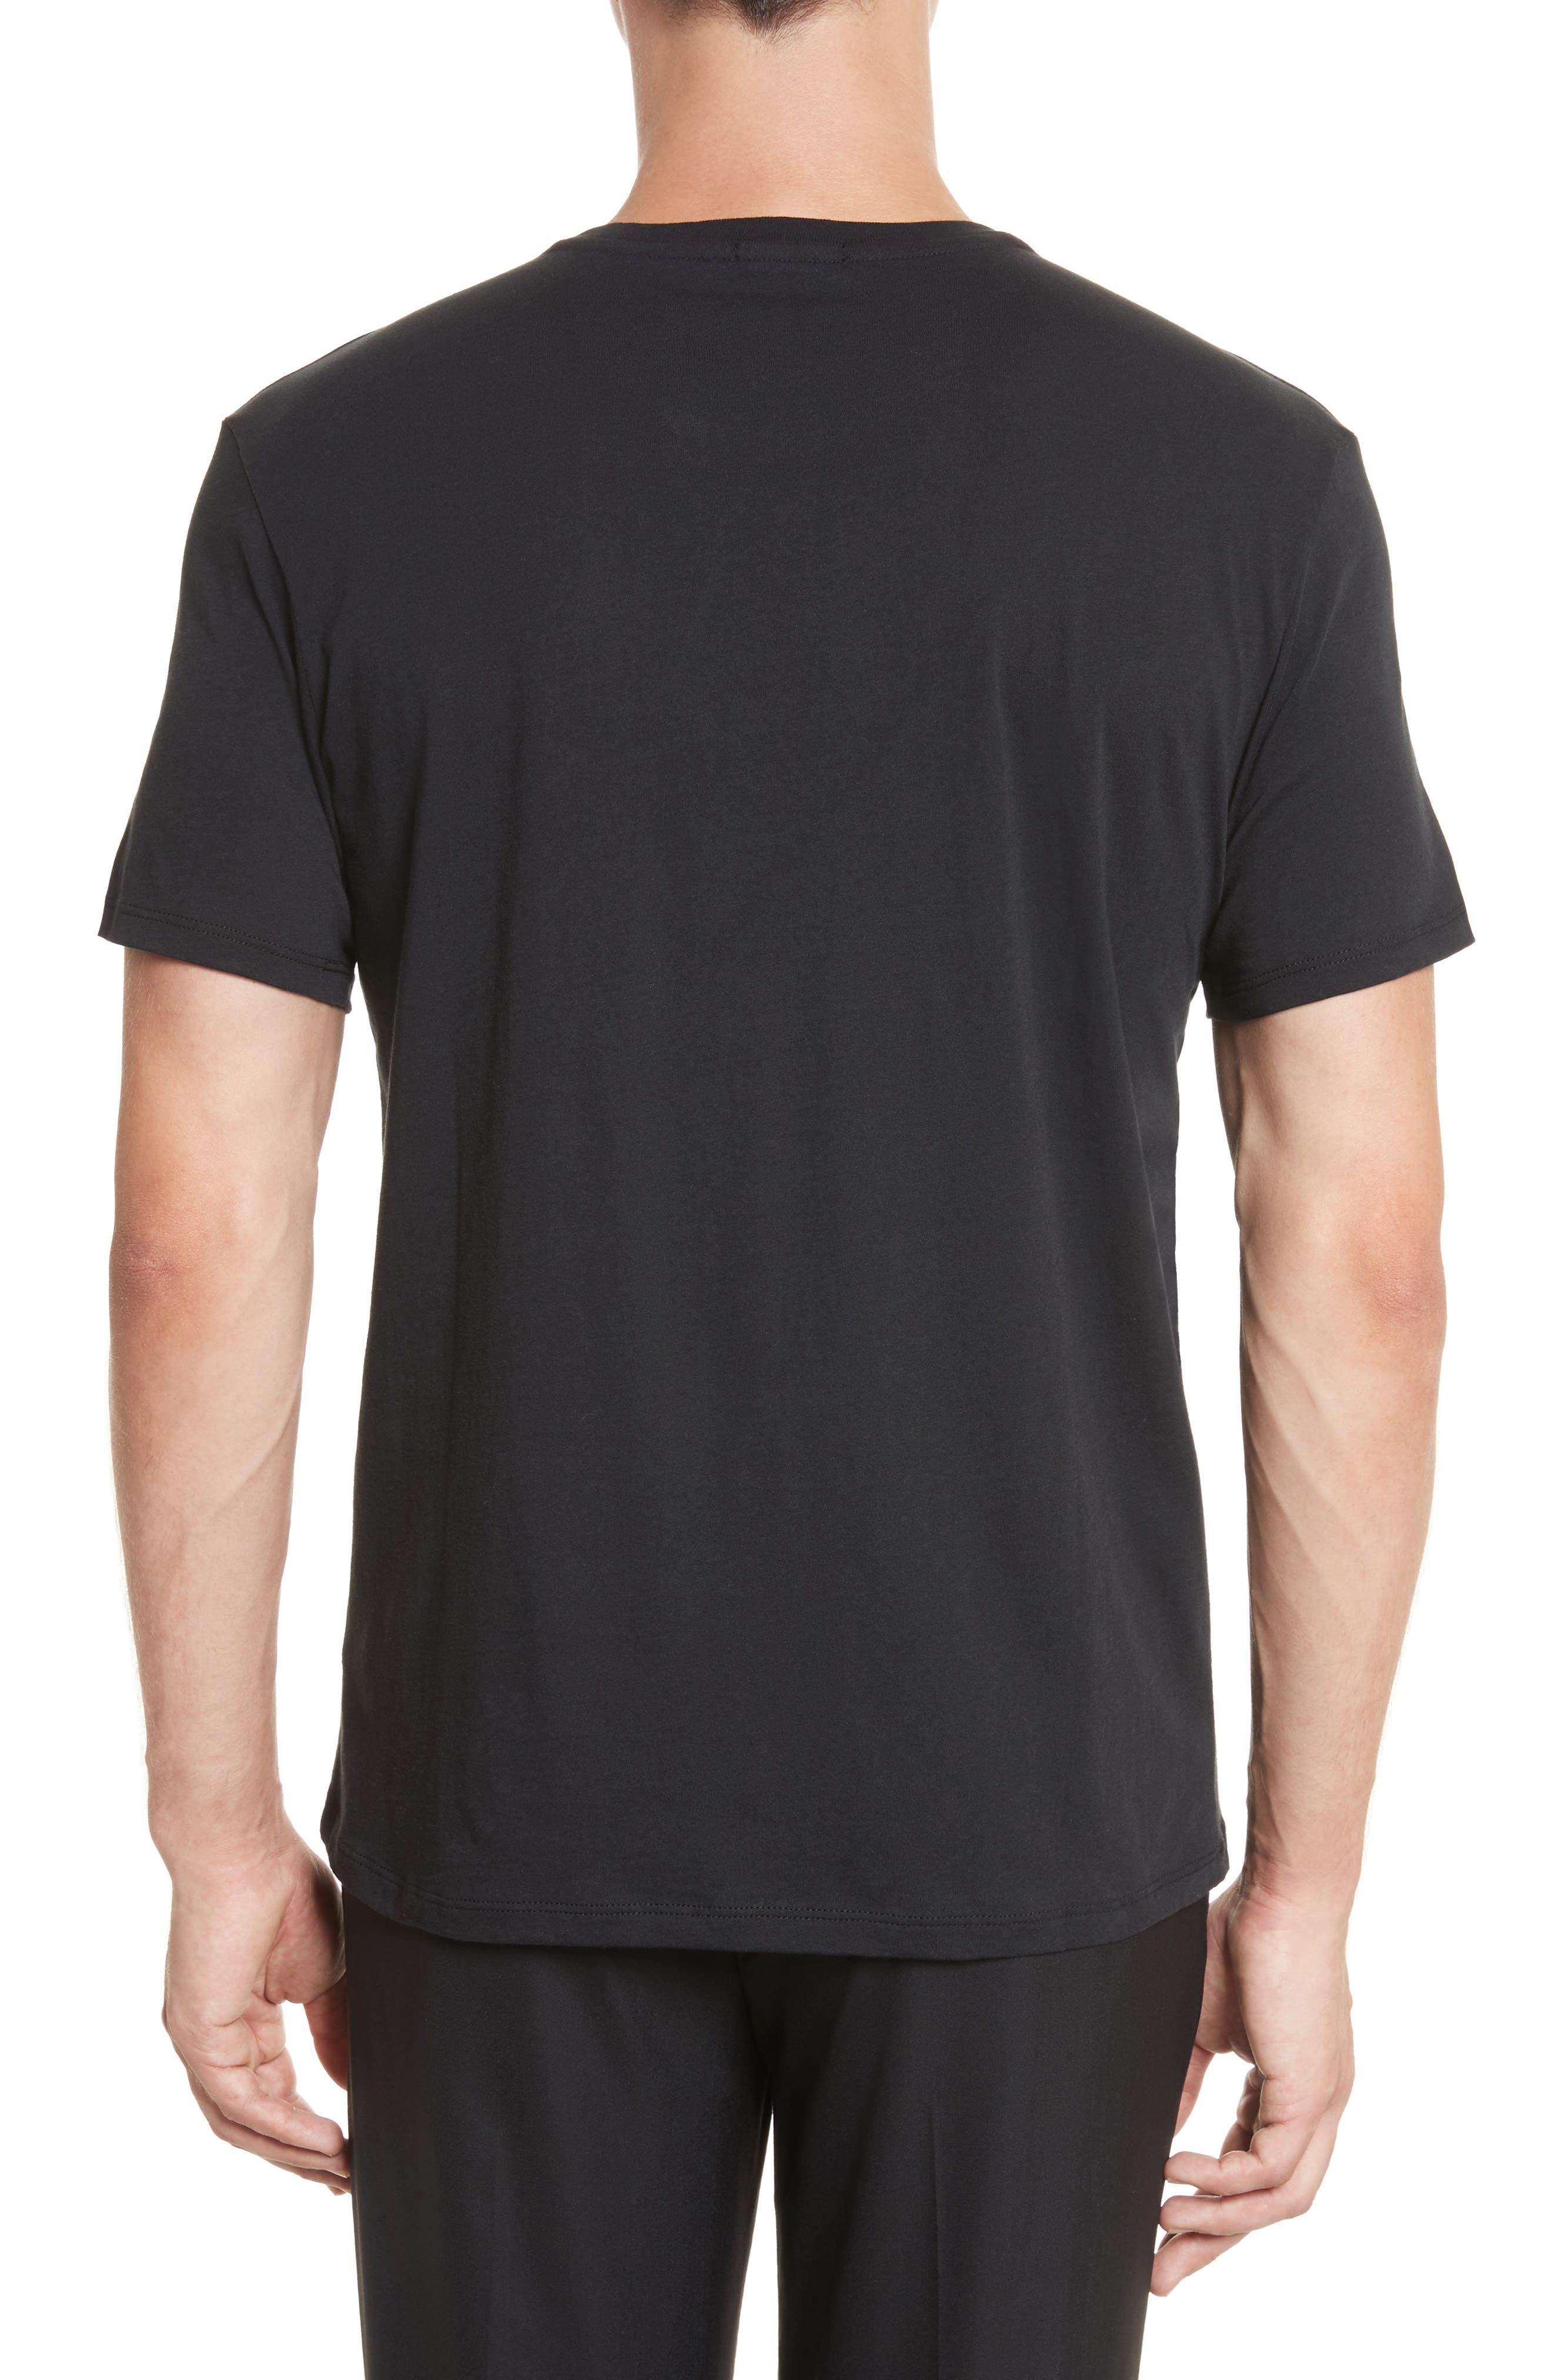 Alternate Image 2  - ATM Anthony Thomas Melillo Cotton Jersey T-Shirt